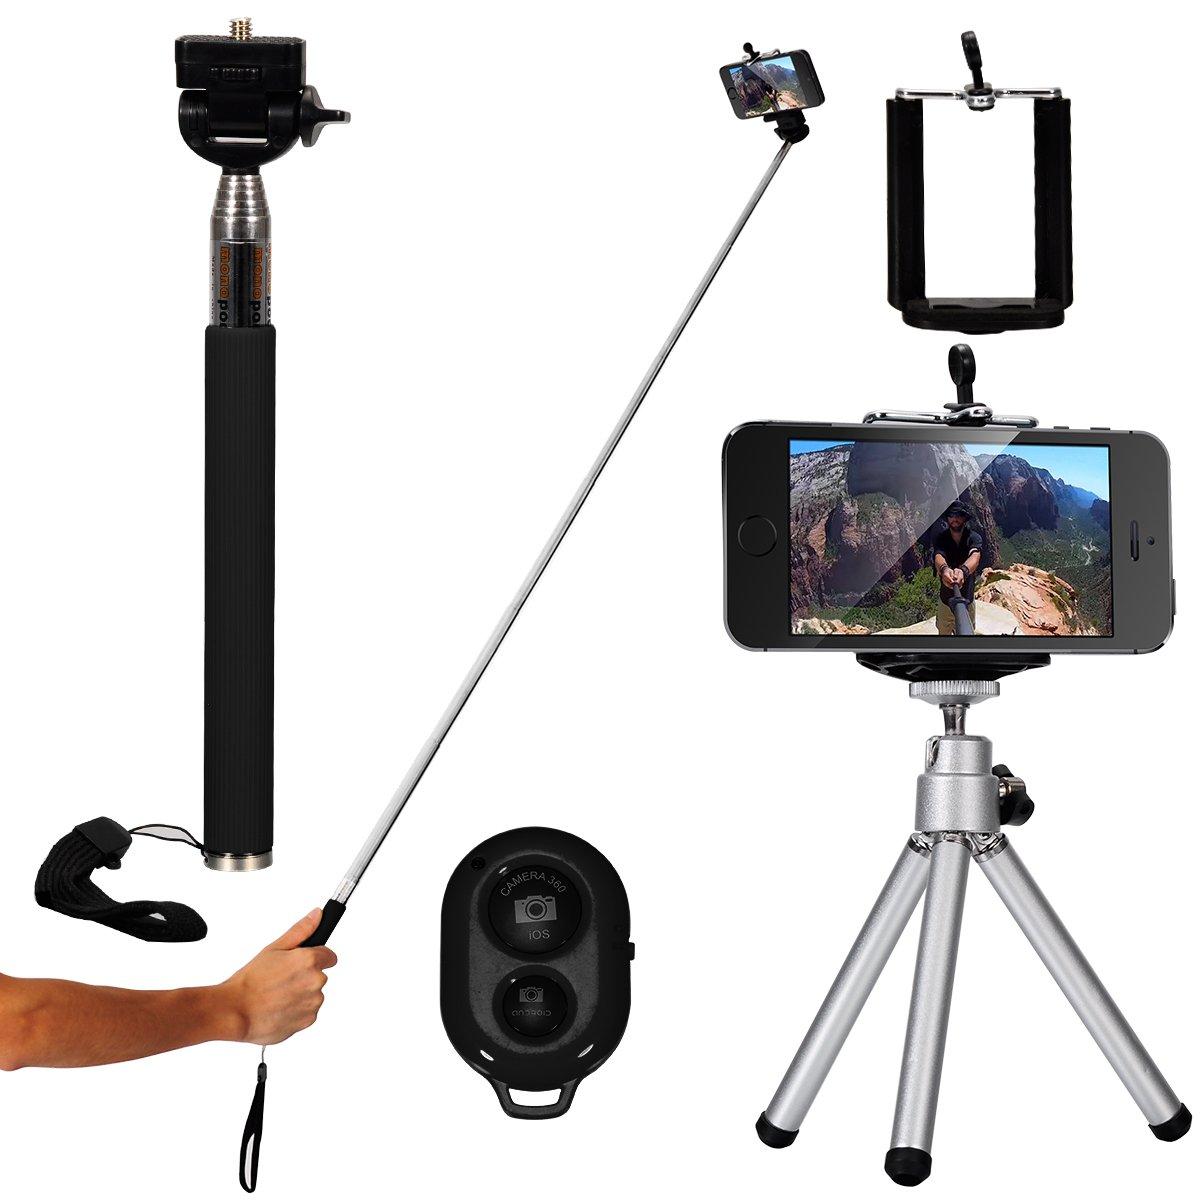 Soporte para fotos selfies telescópico